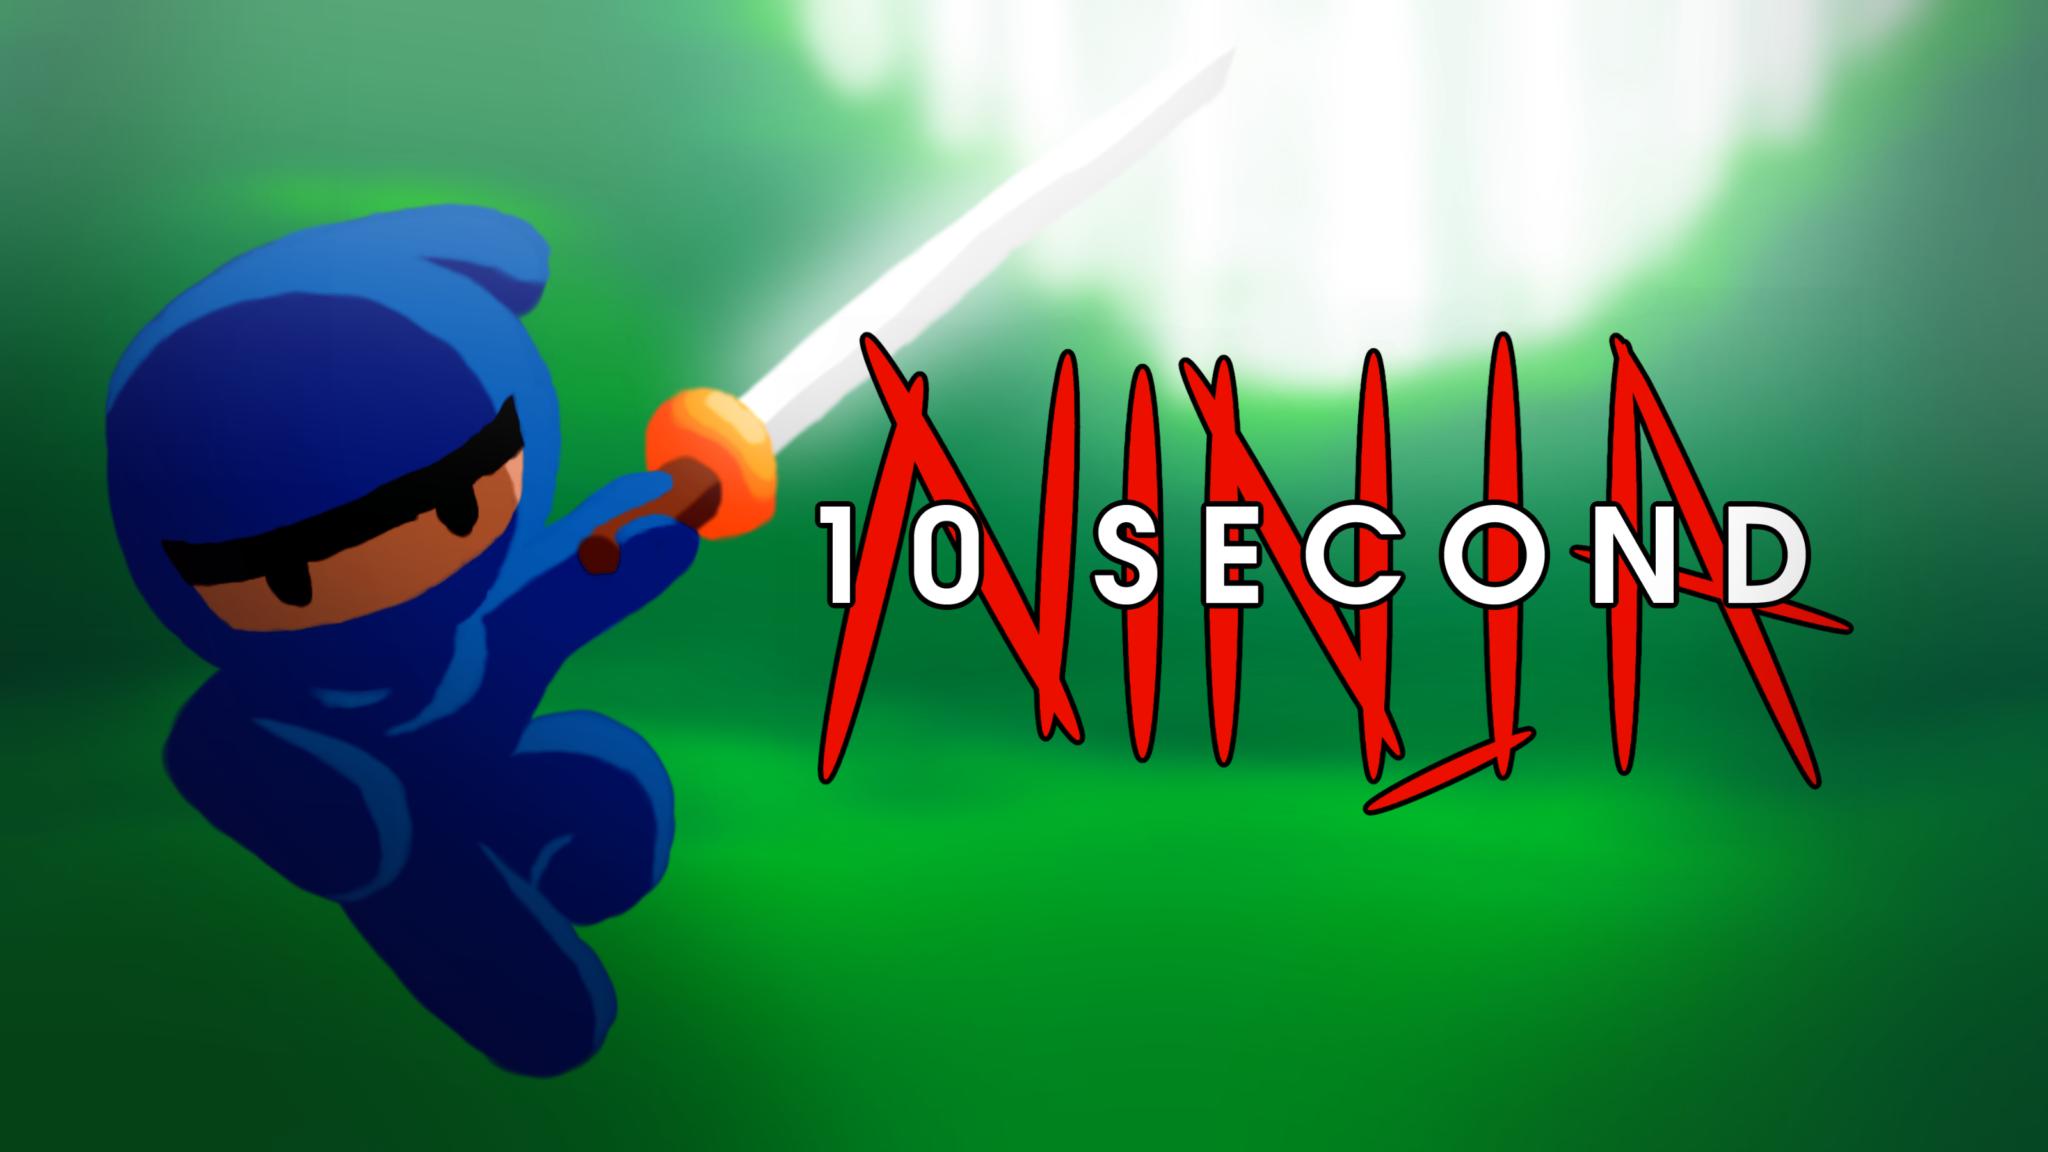 Look Out Robot Hitler, it's 10 Second Ninja!